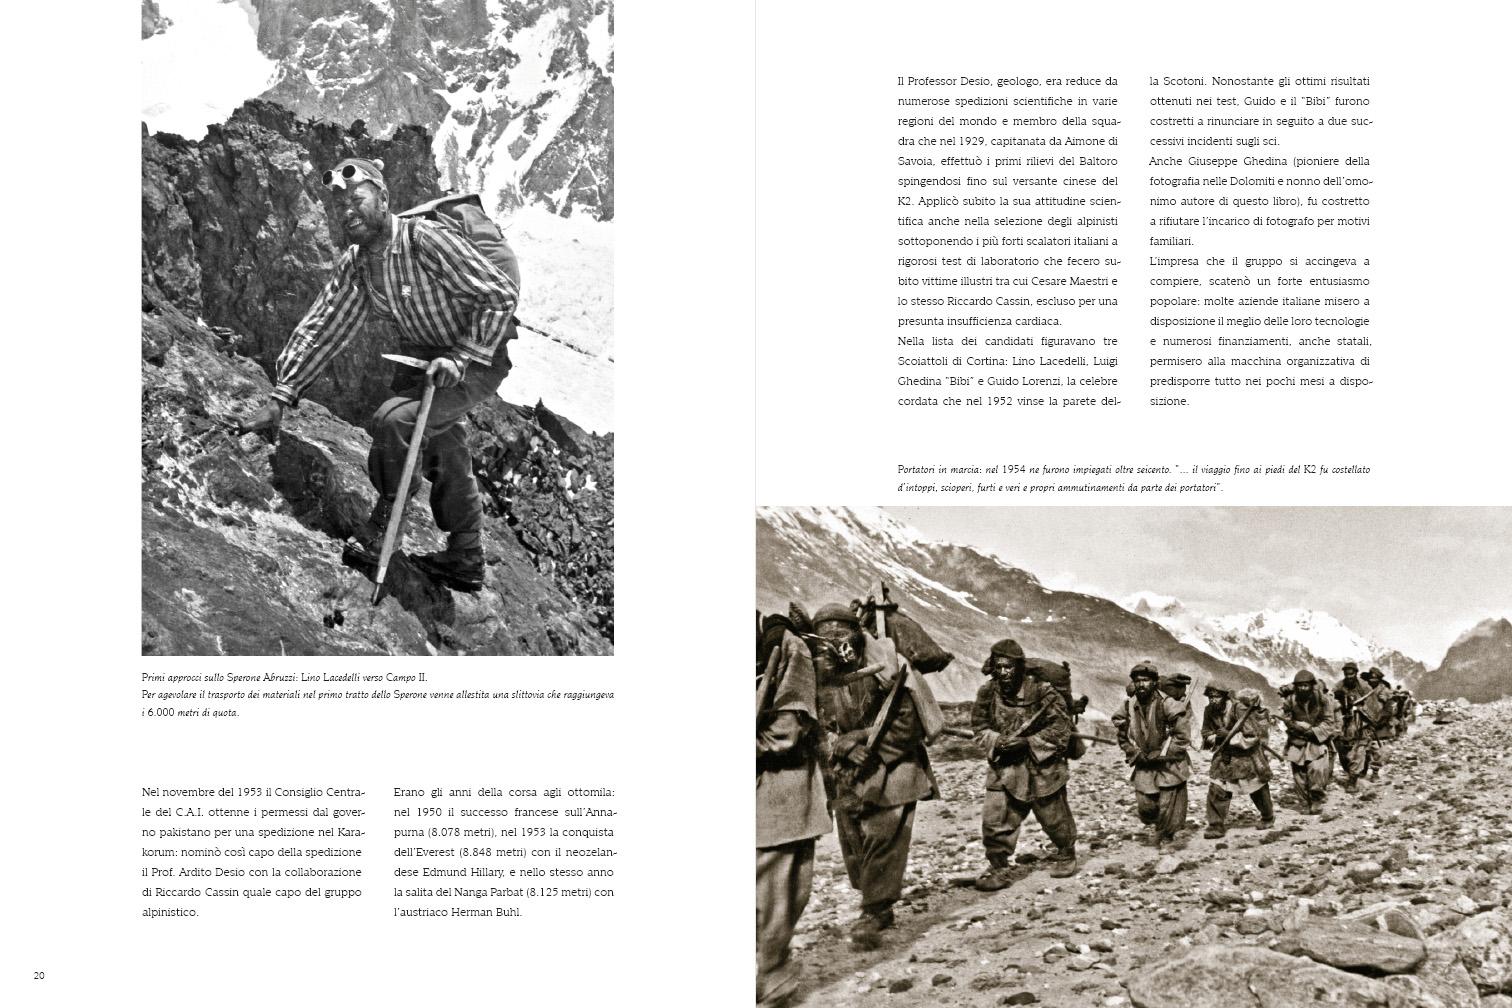 K2 EXPEDITION 1954-2004 Giuseppe Ghedina Fotografo - 012.jpg